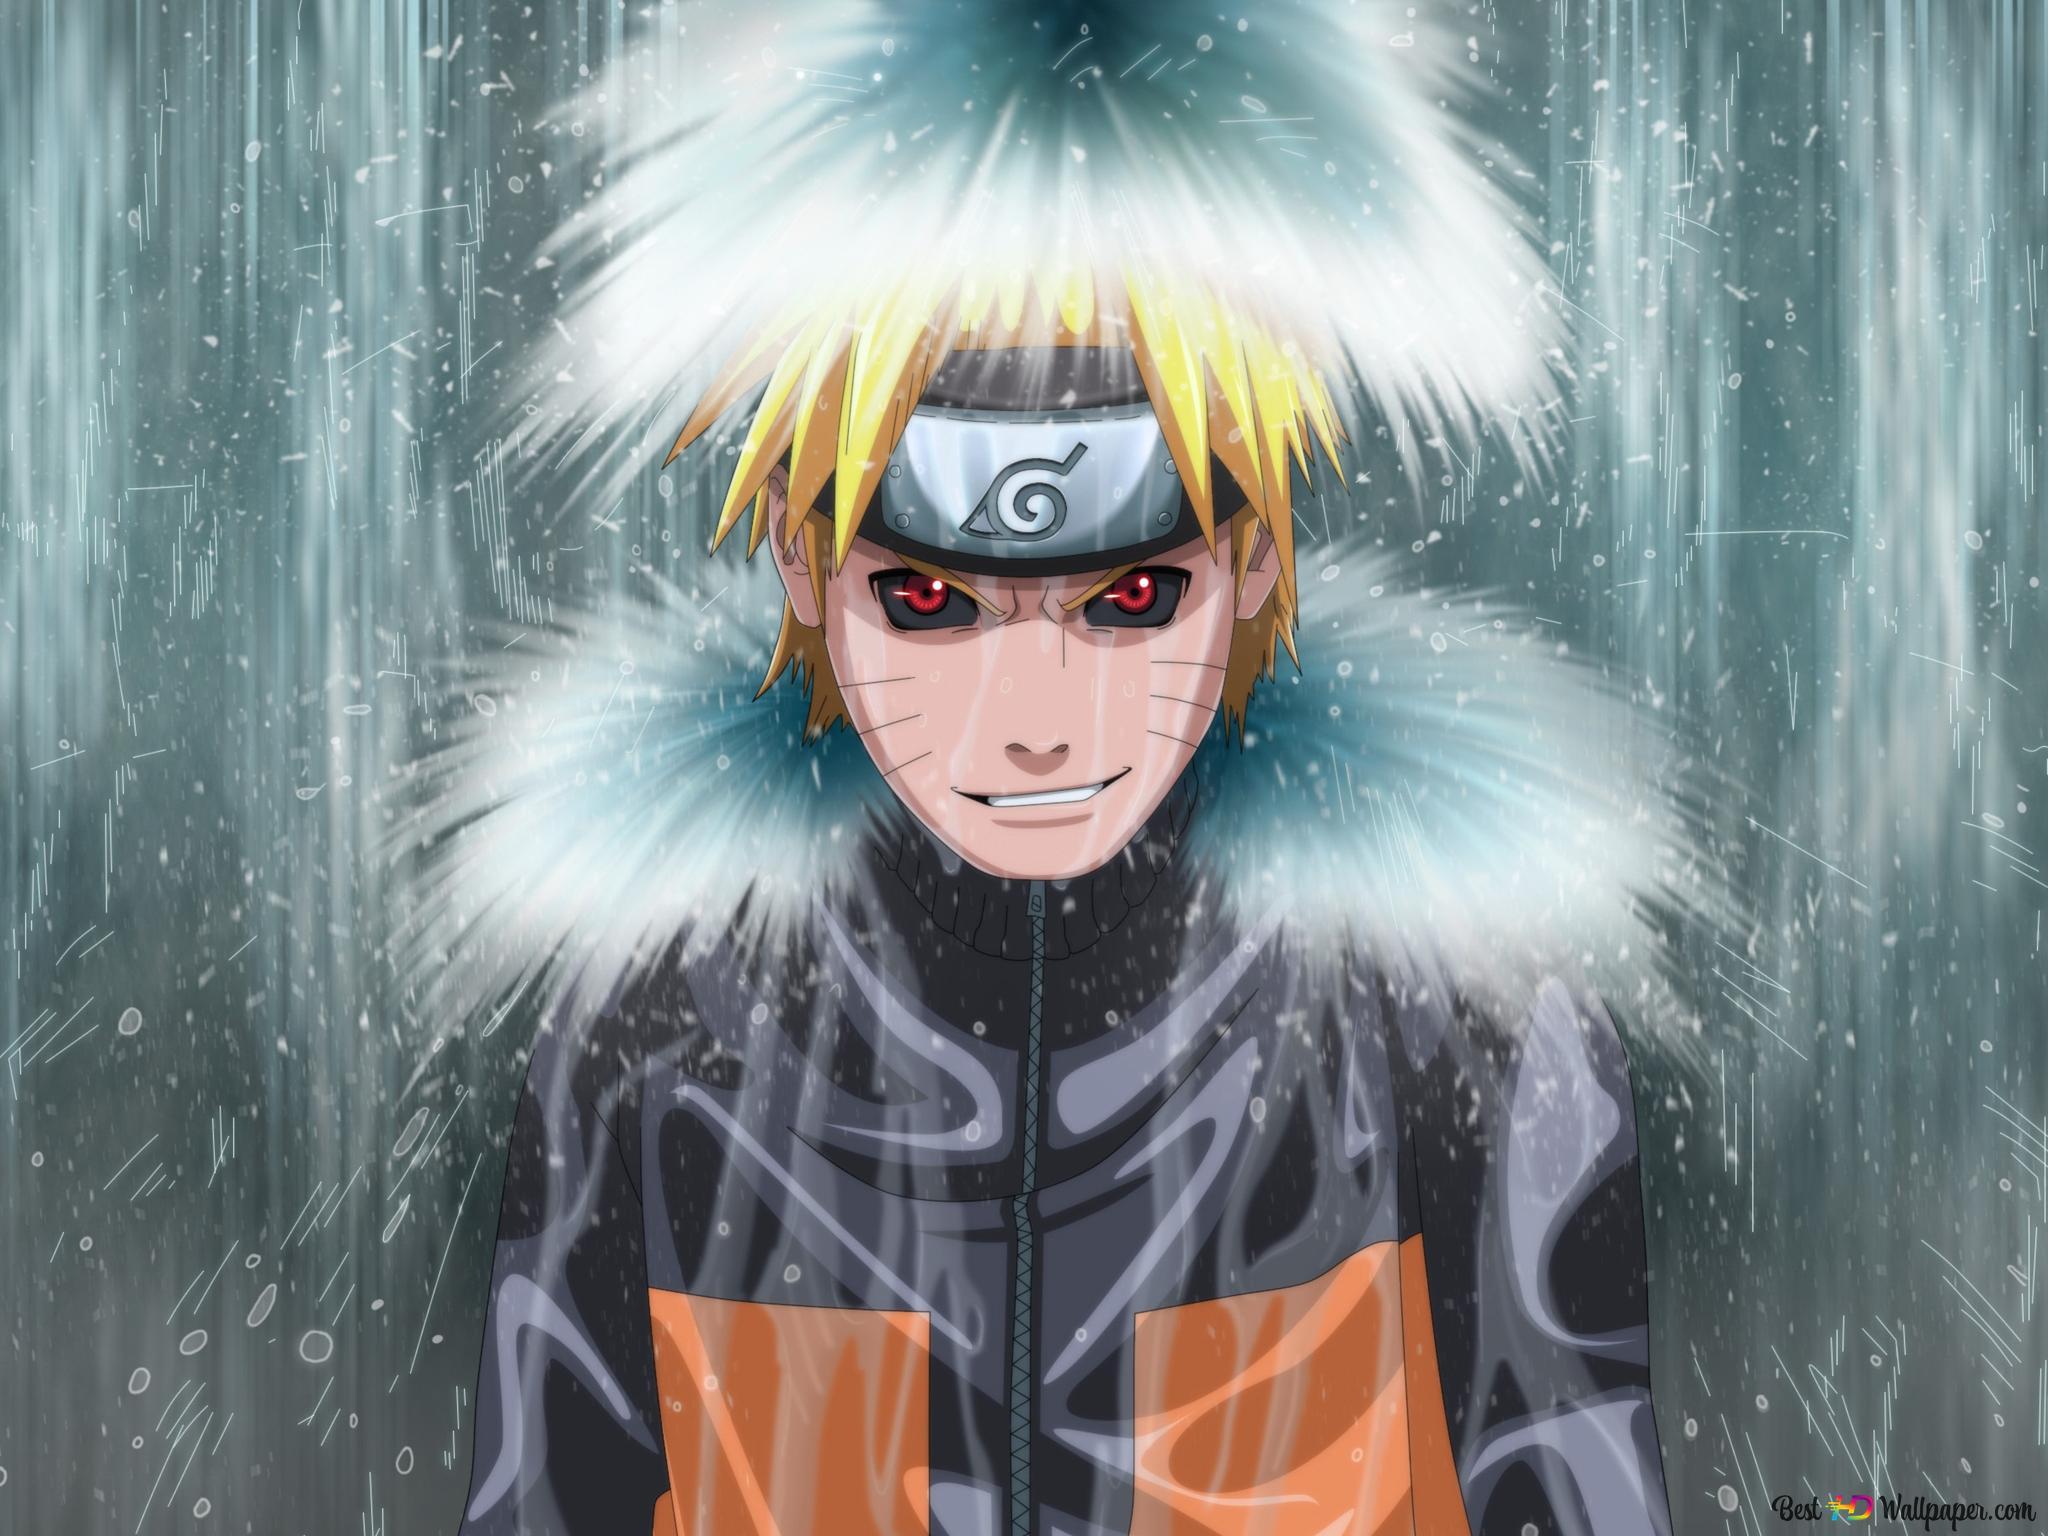 Naruto ナルト 疾風伝 インサイドナルト Hd壁紙のダウンロード